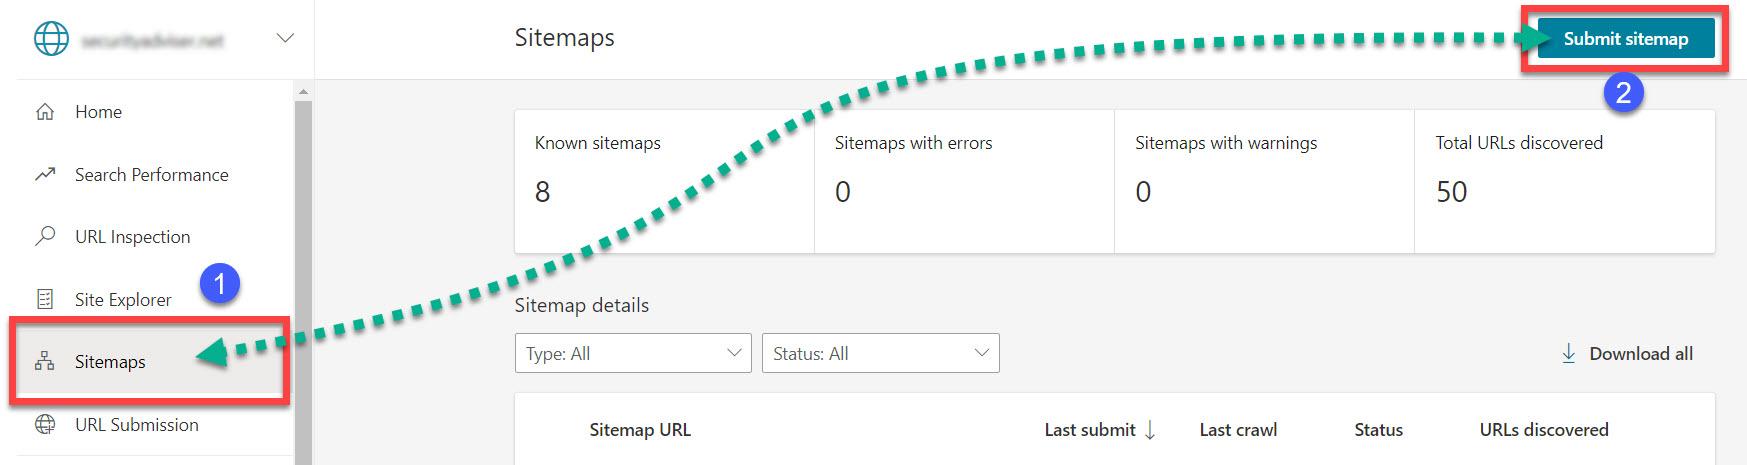 Sitemaps tab in Bing Webmaster Tools